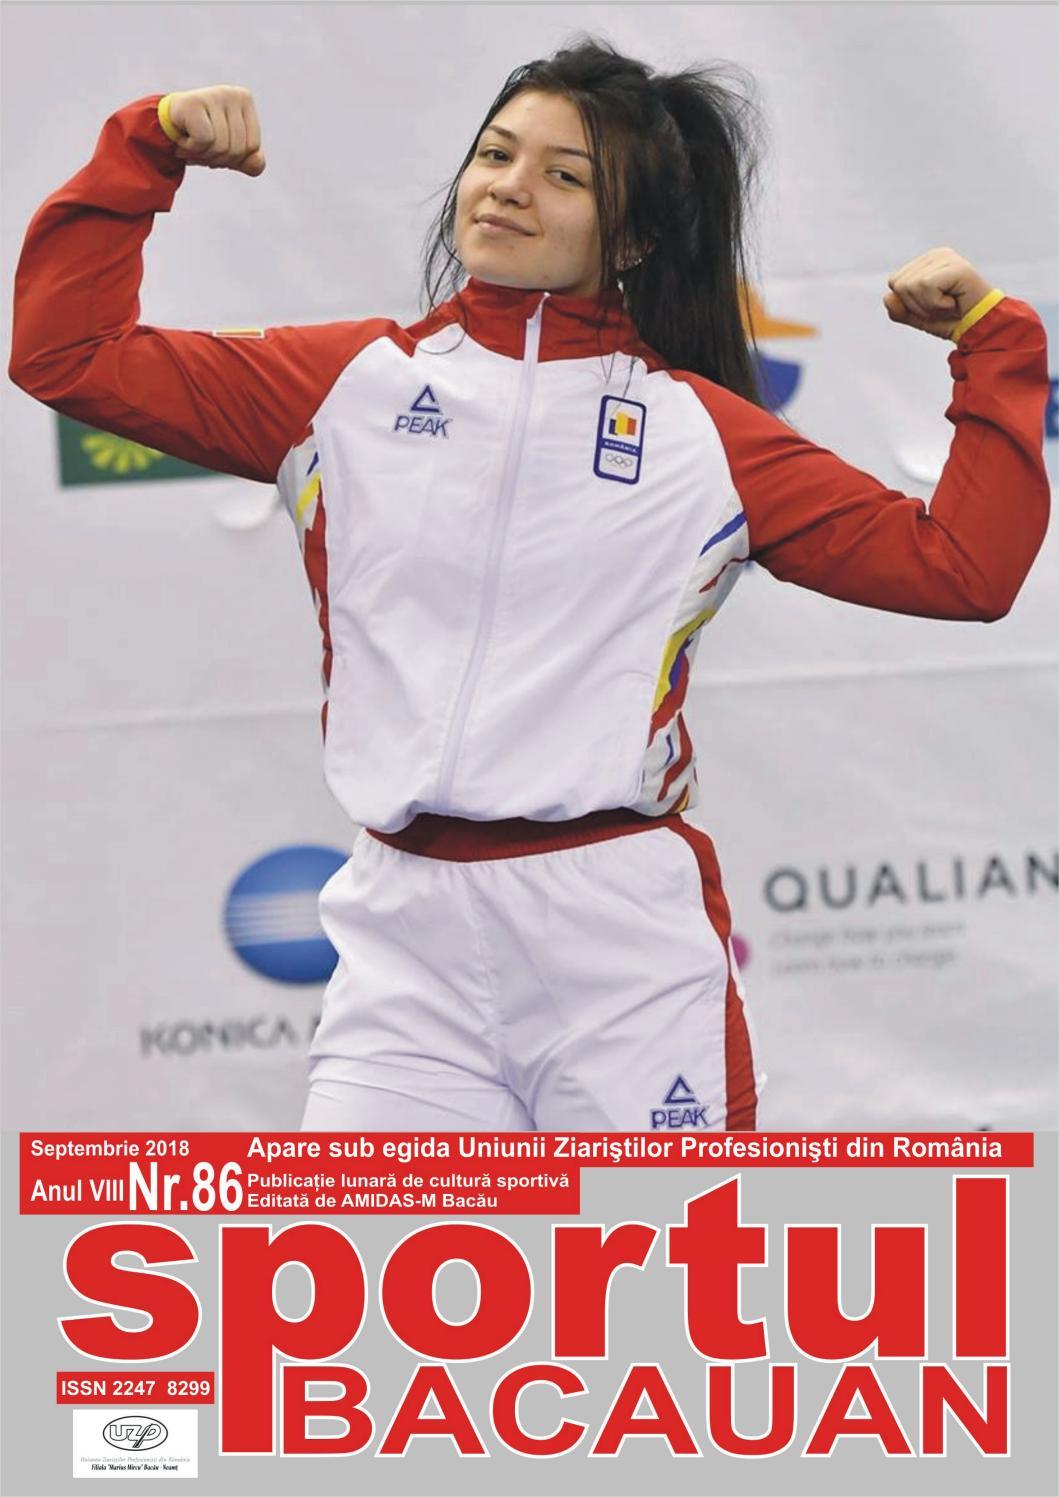 Anamaria Isachi sportul bacauan nr.86leonard popa - issuu